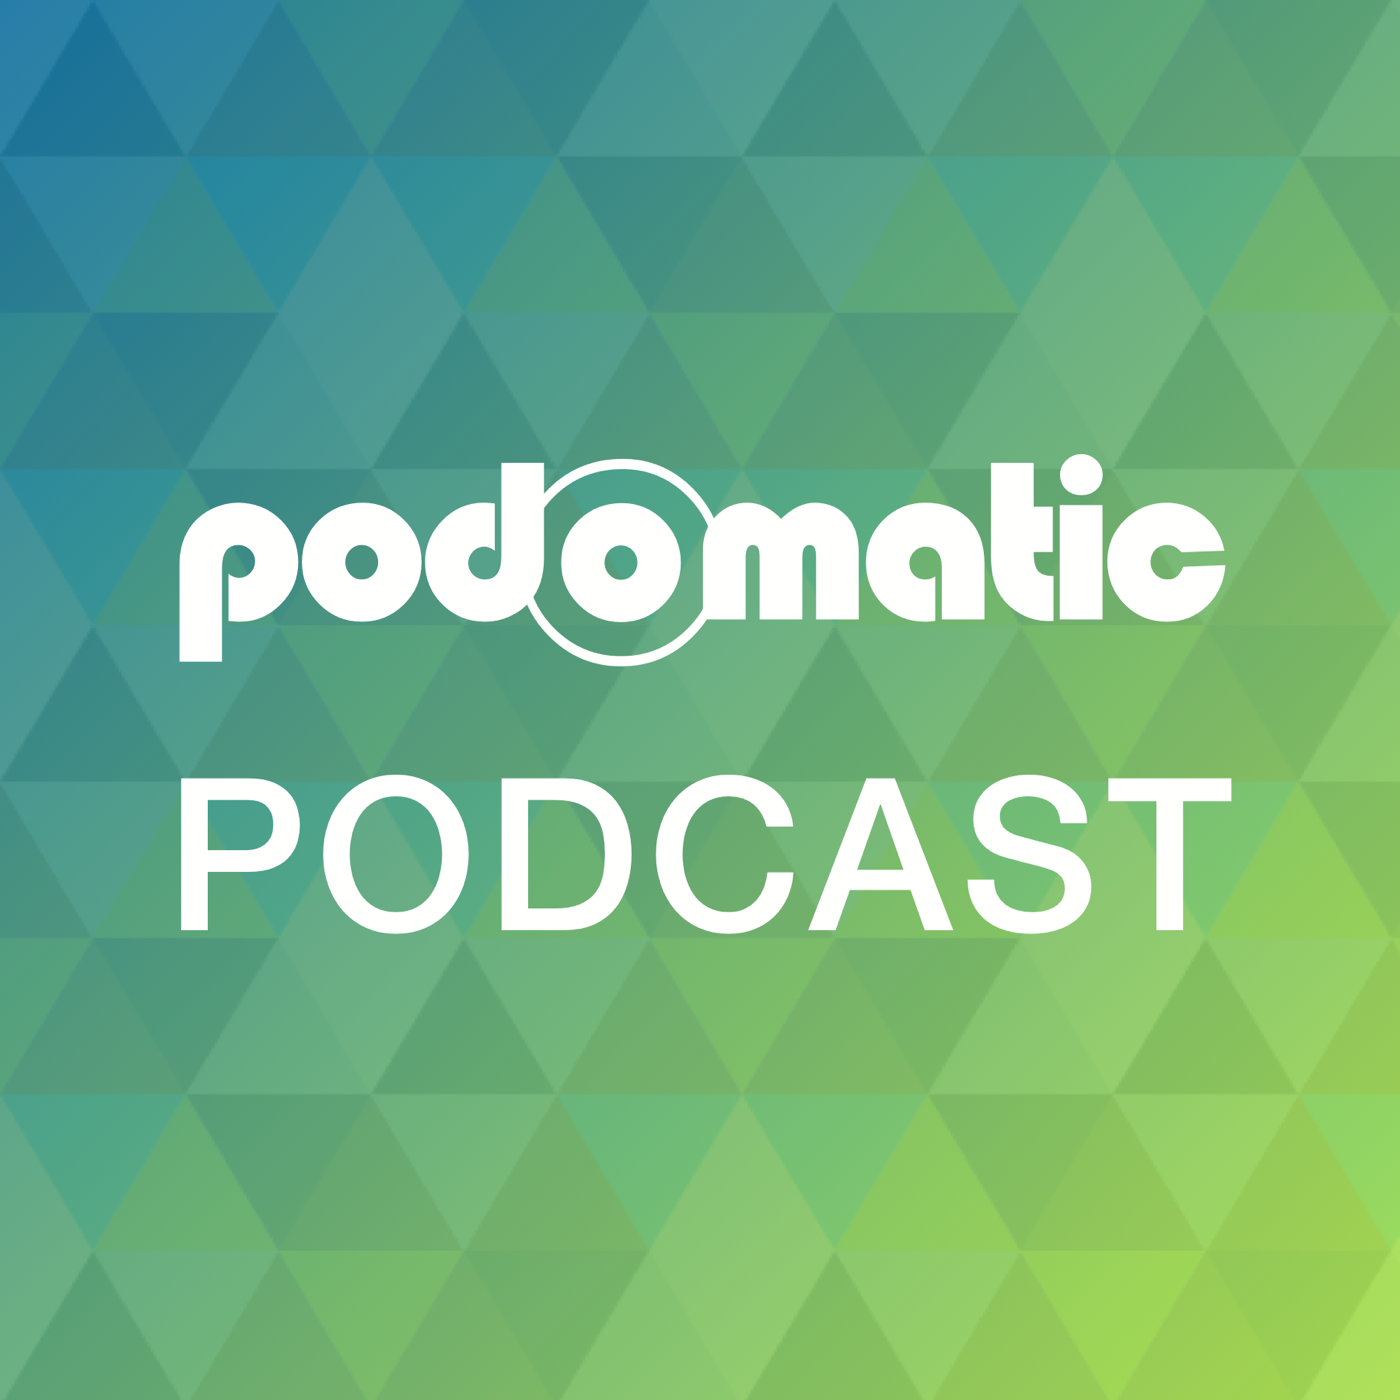 7mood ali's Podcast